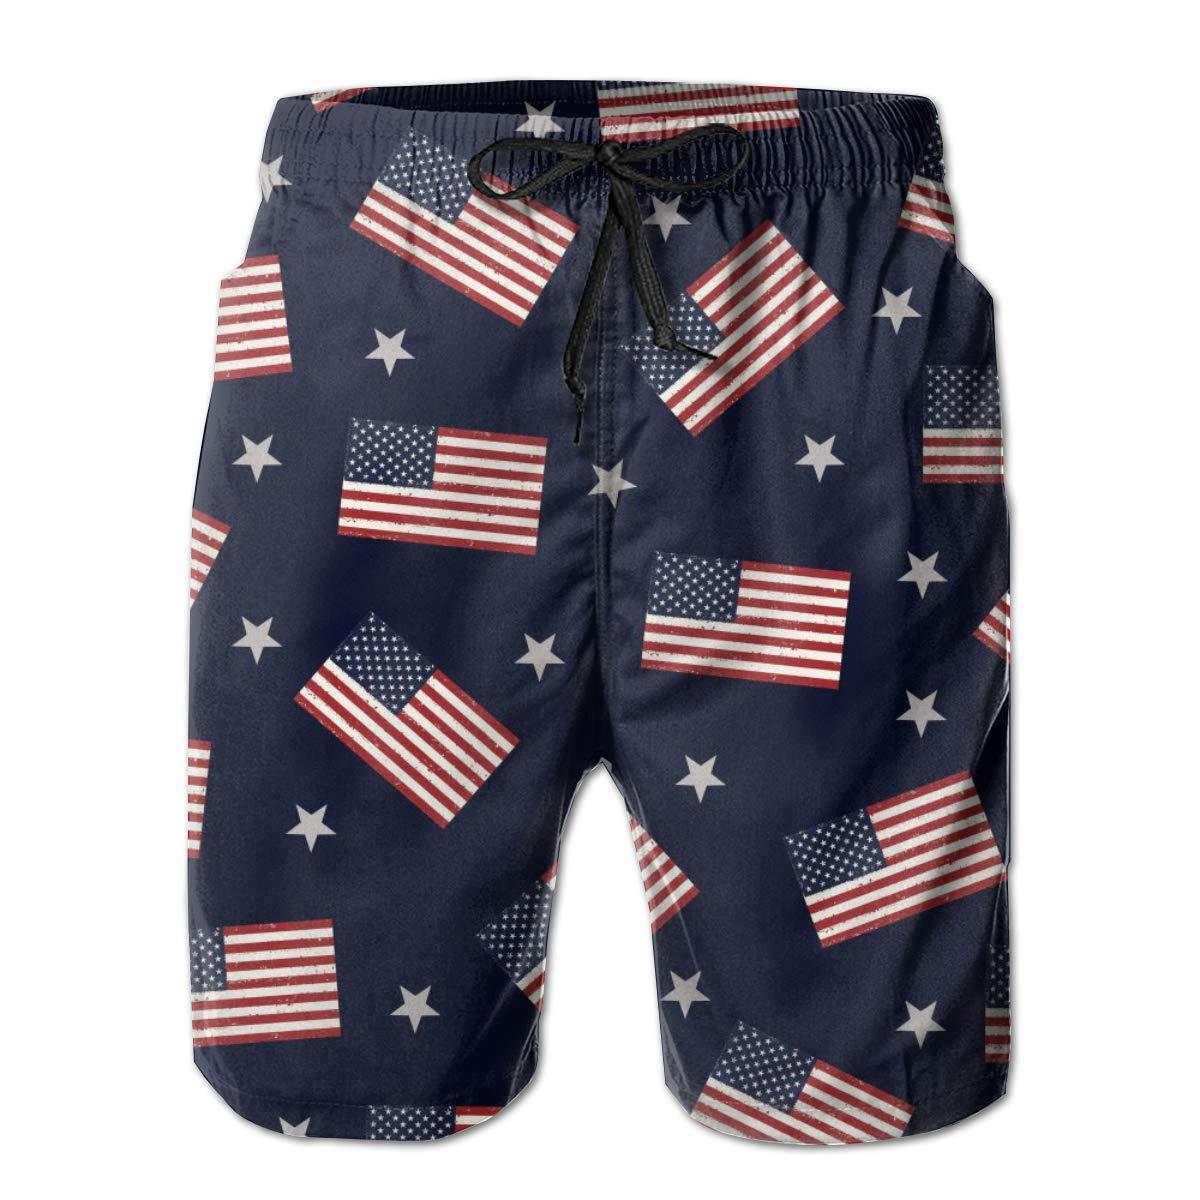 Galaxy Voyage USA American Flag Boys Mens Swim Trunks Surf Pants 3D Swimming Trunks Board Shorts for Men